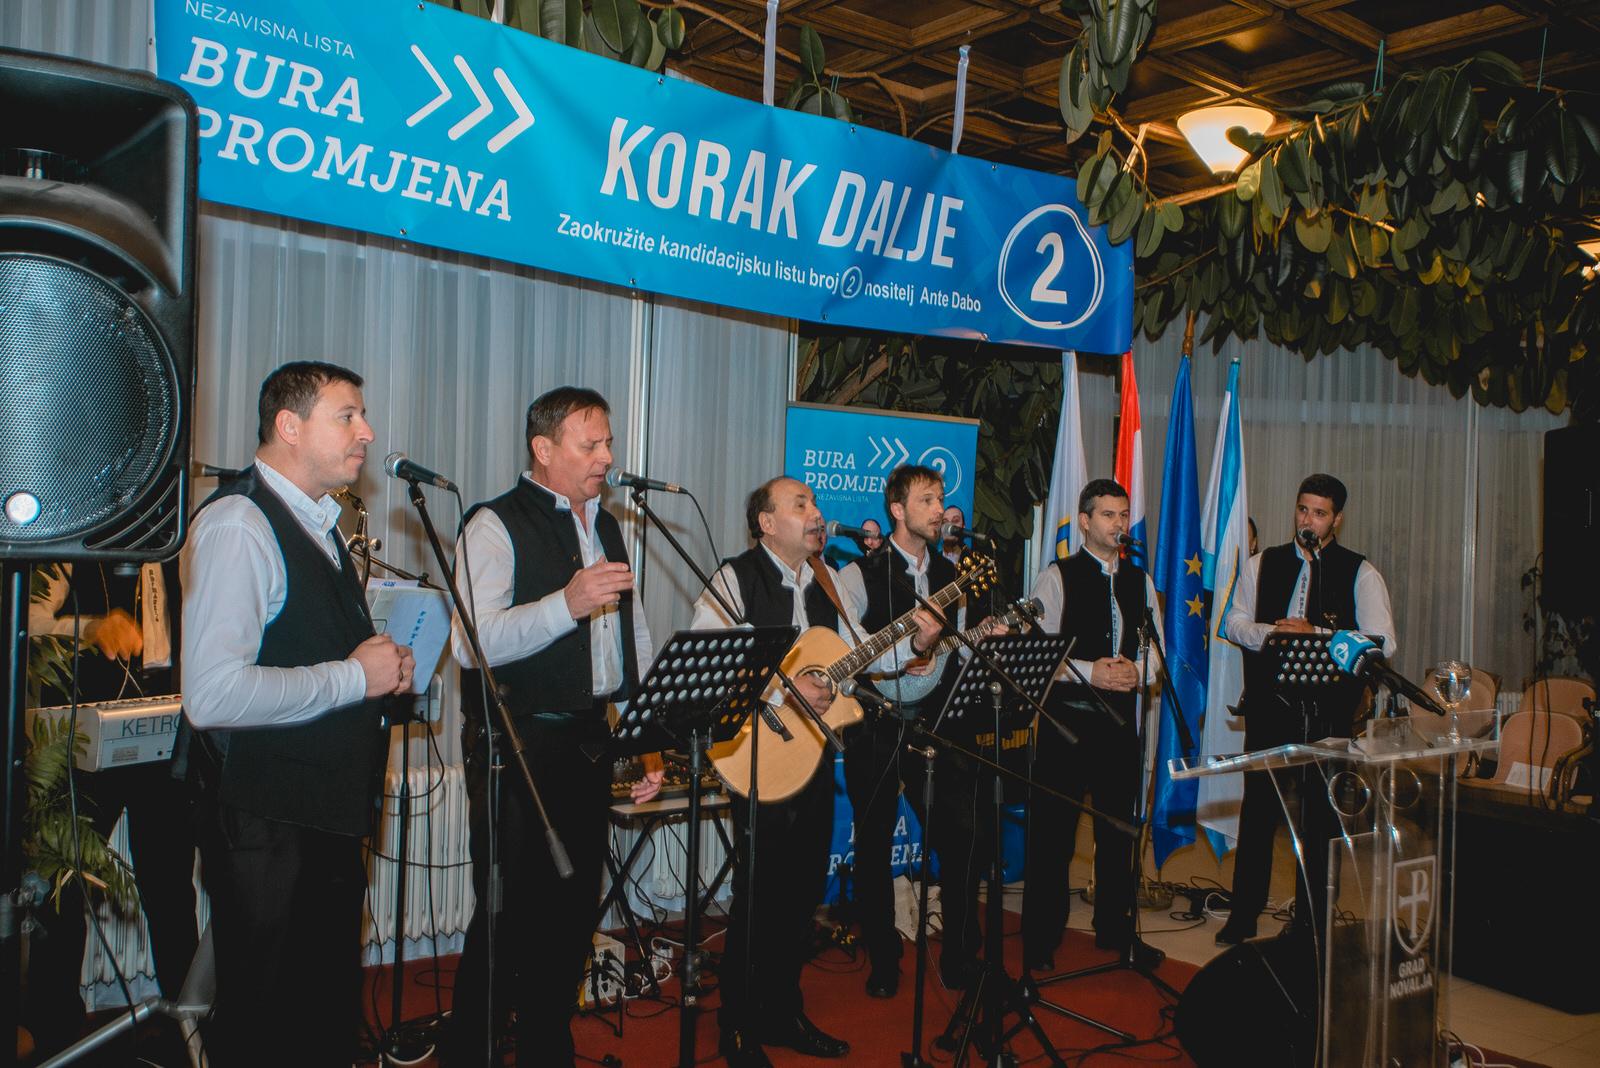 likaclub_bura-promjena_novalja_2019-17